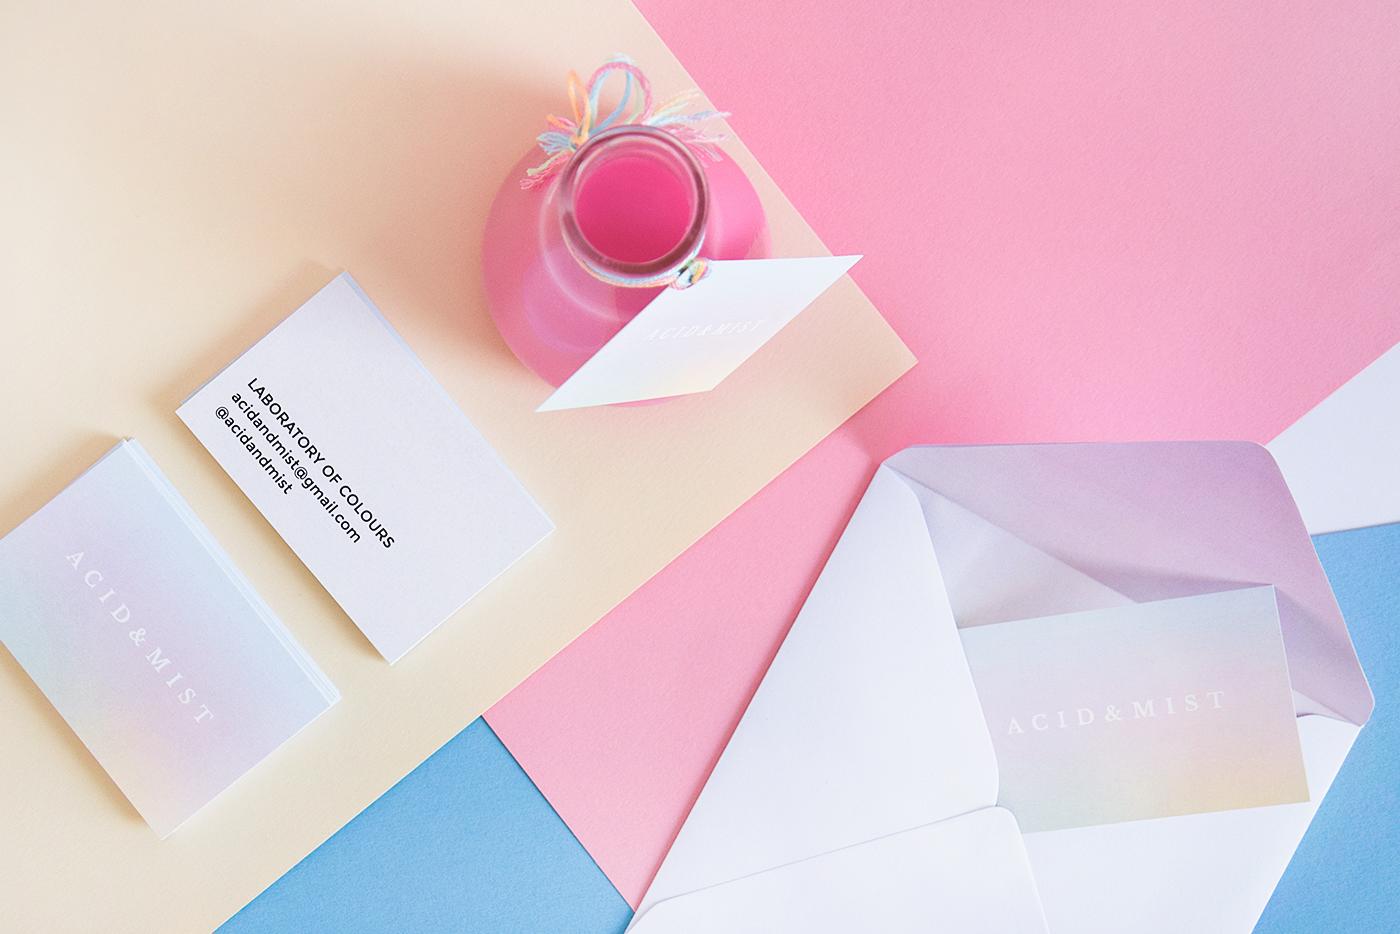 colour brand new colorful inspiration design pastel colors Mockup logo